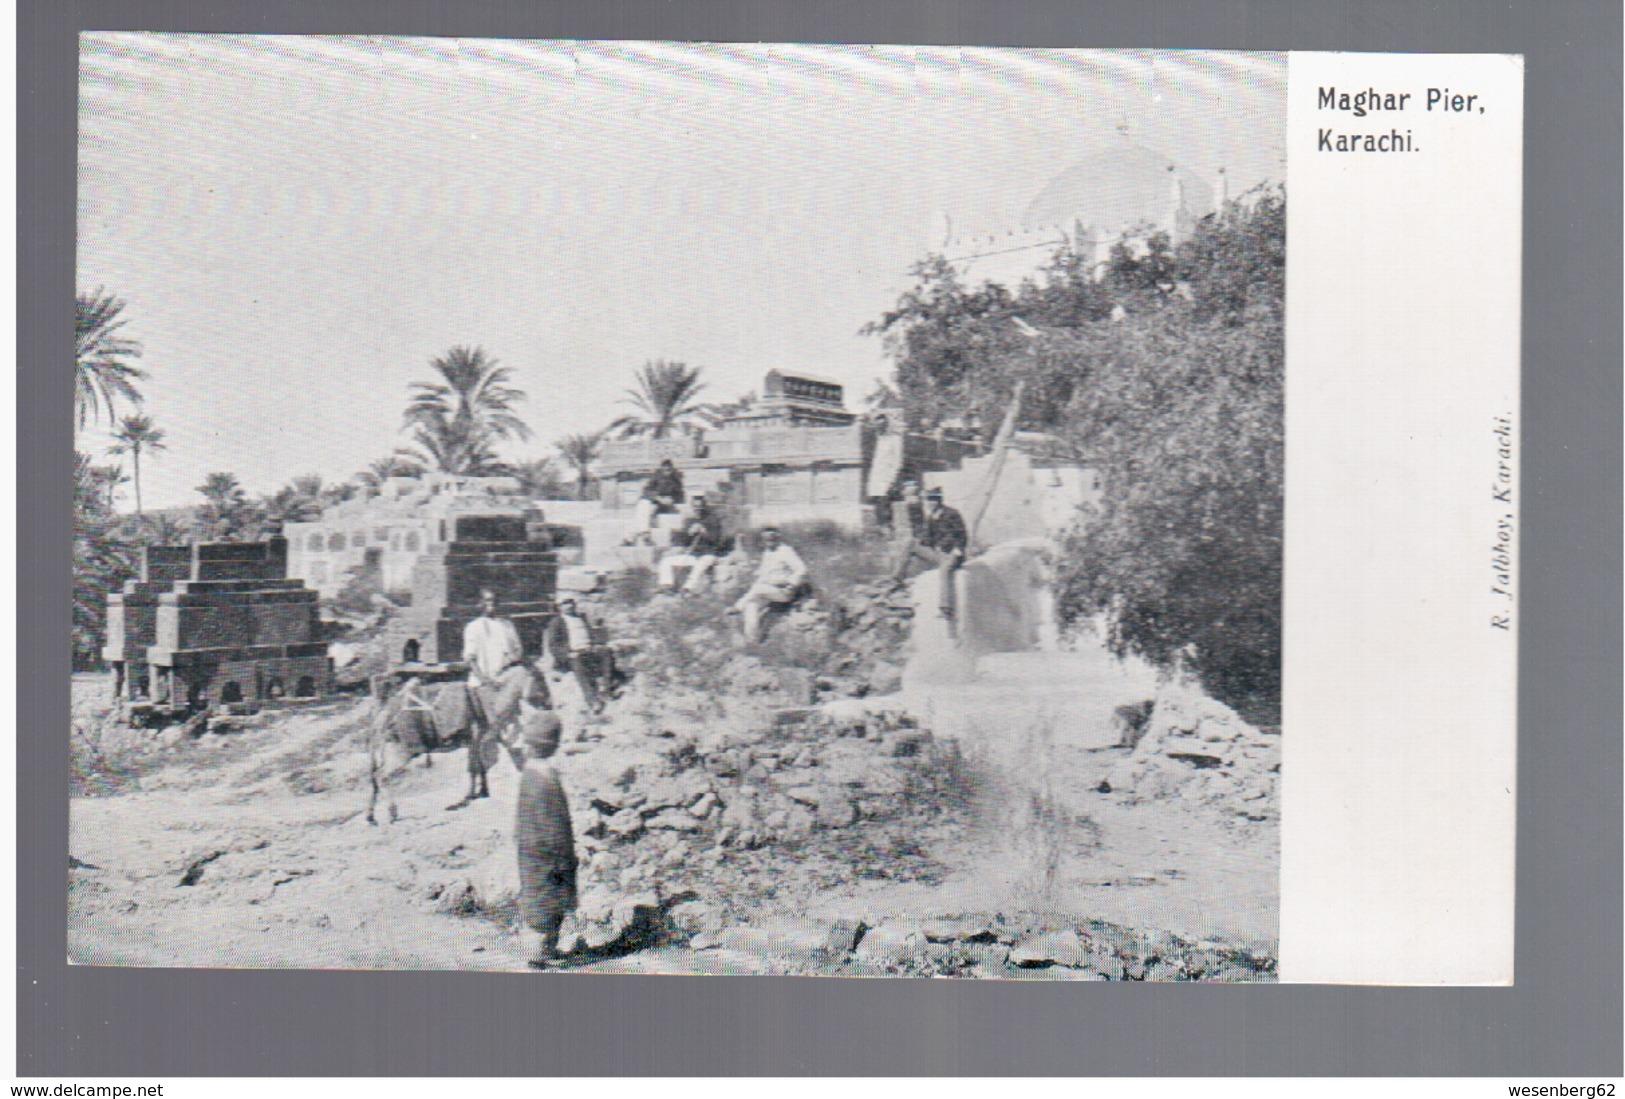 PAKISTAN Karachi, Maghar Pier Ca 1905 OLD POSTCARD - Pakistan